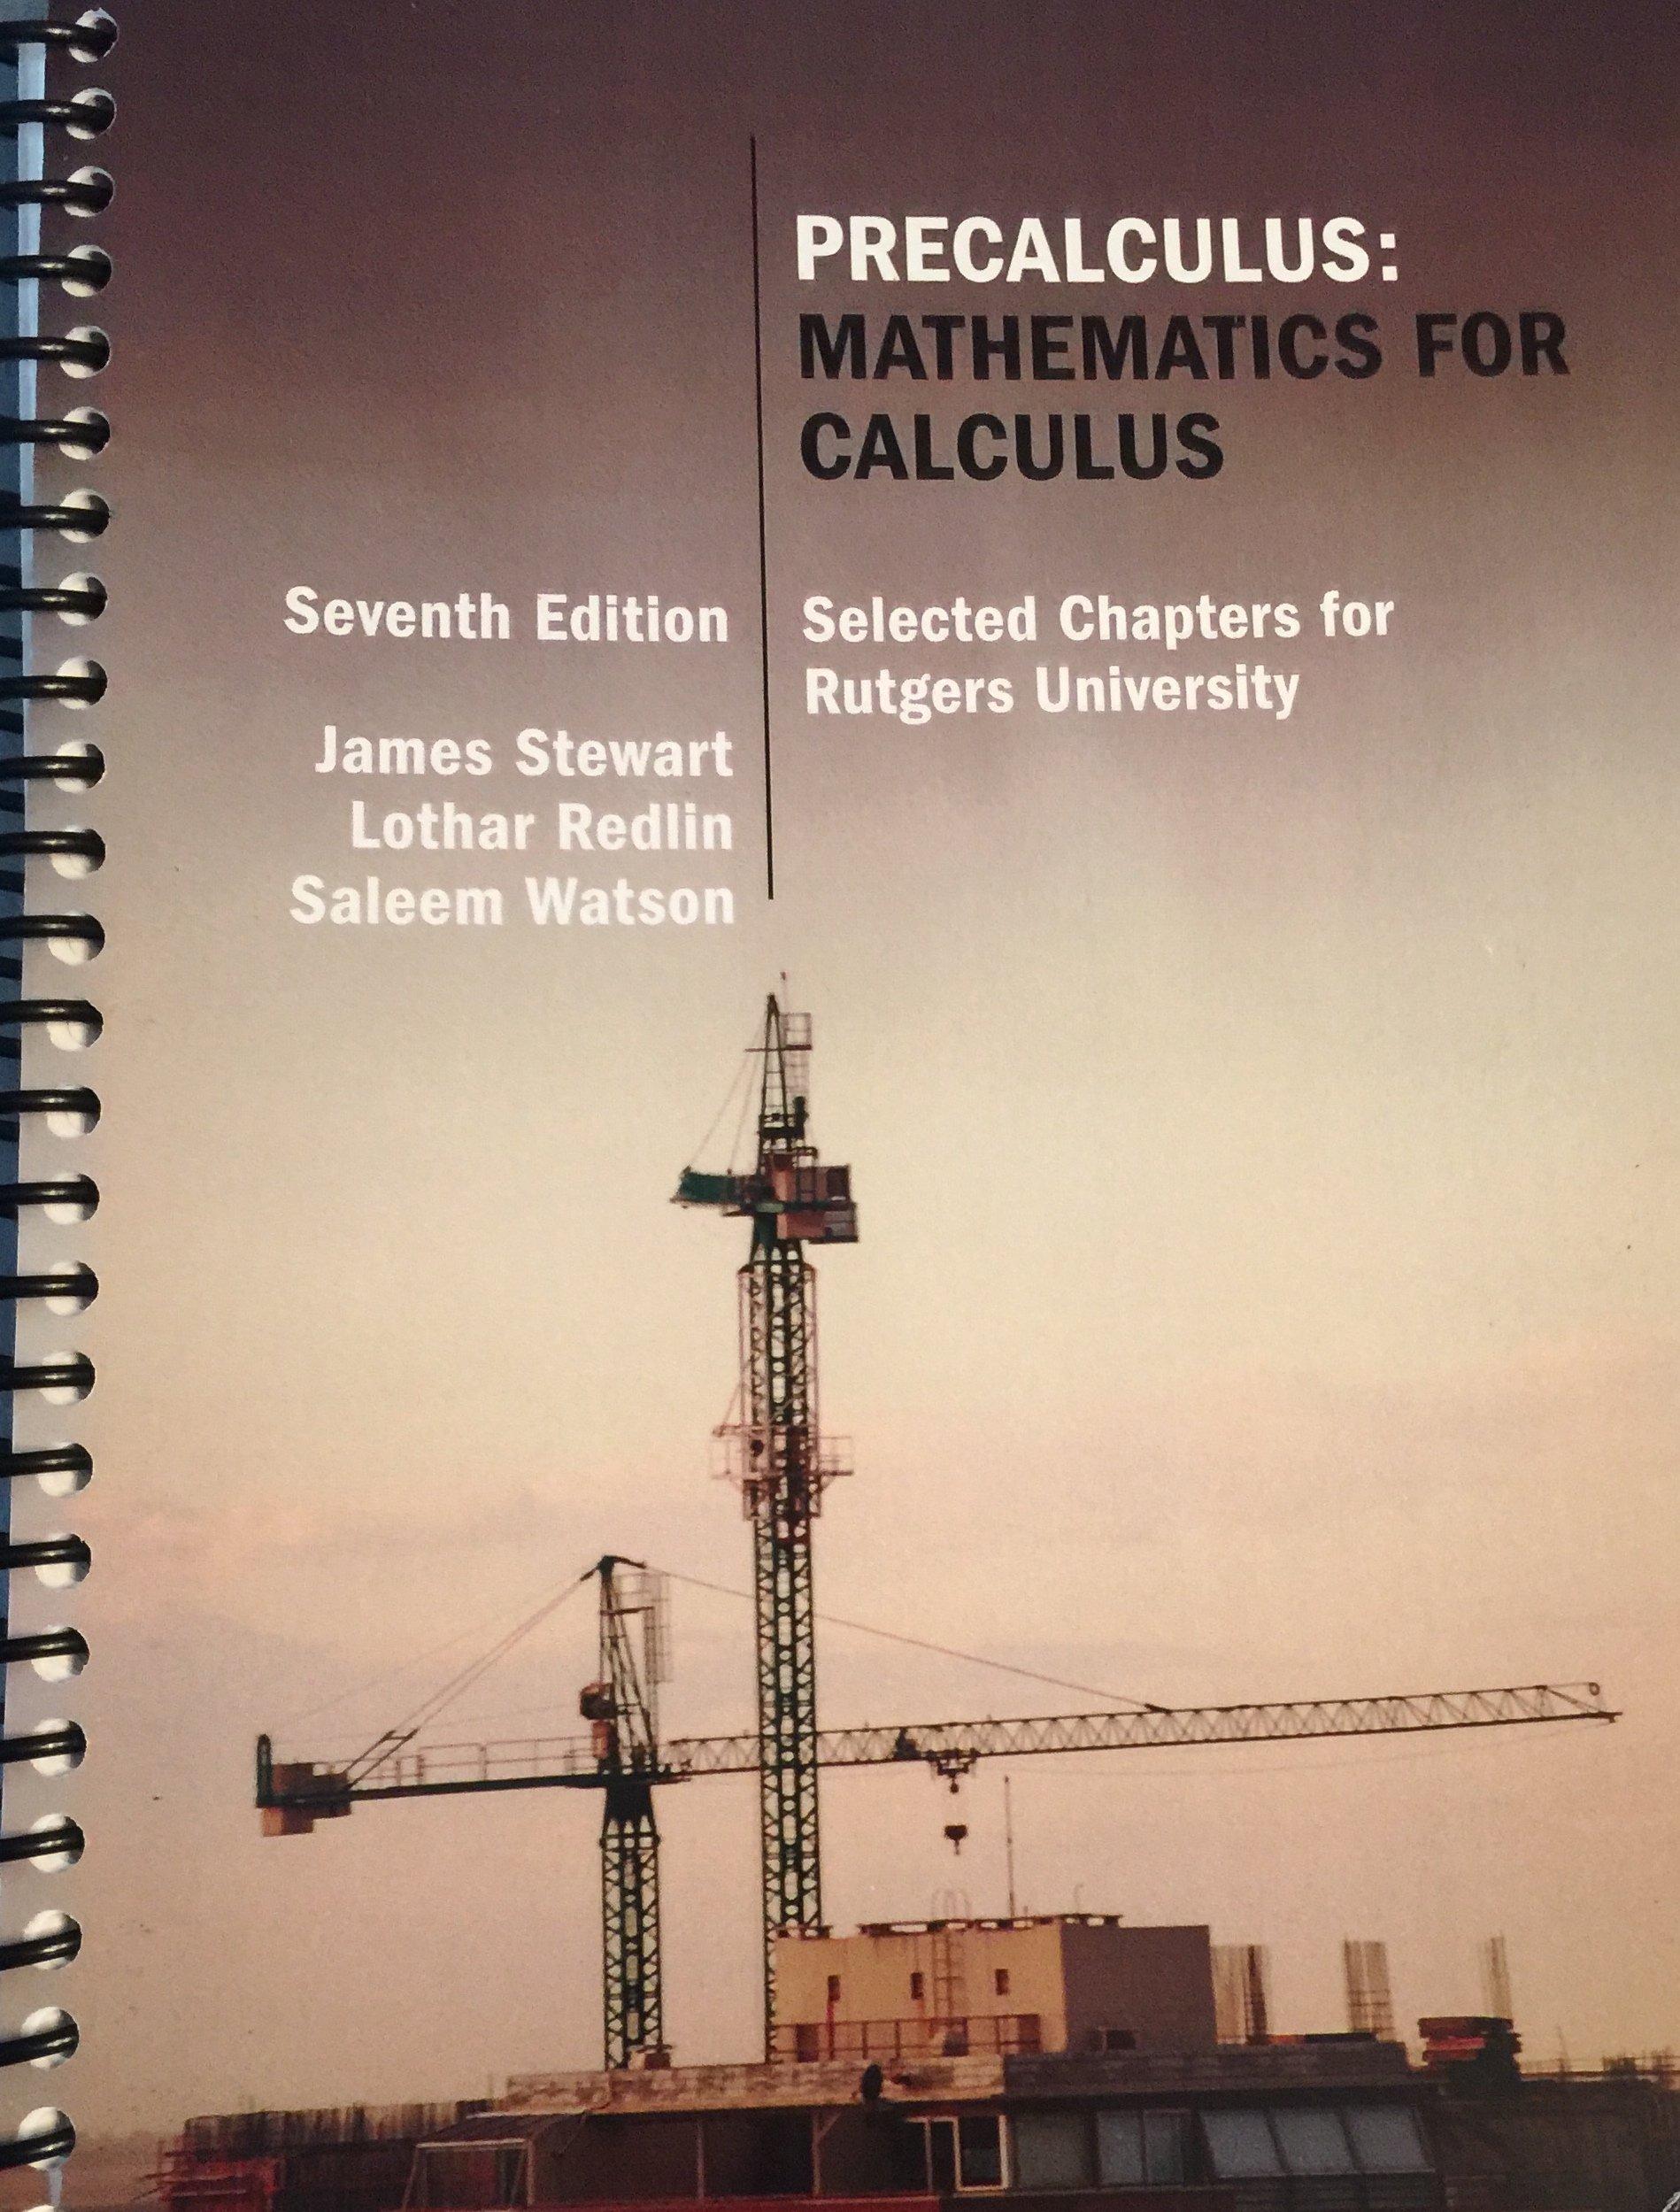 Precalculus Mathematics For Calculus James Stewart Lothar